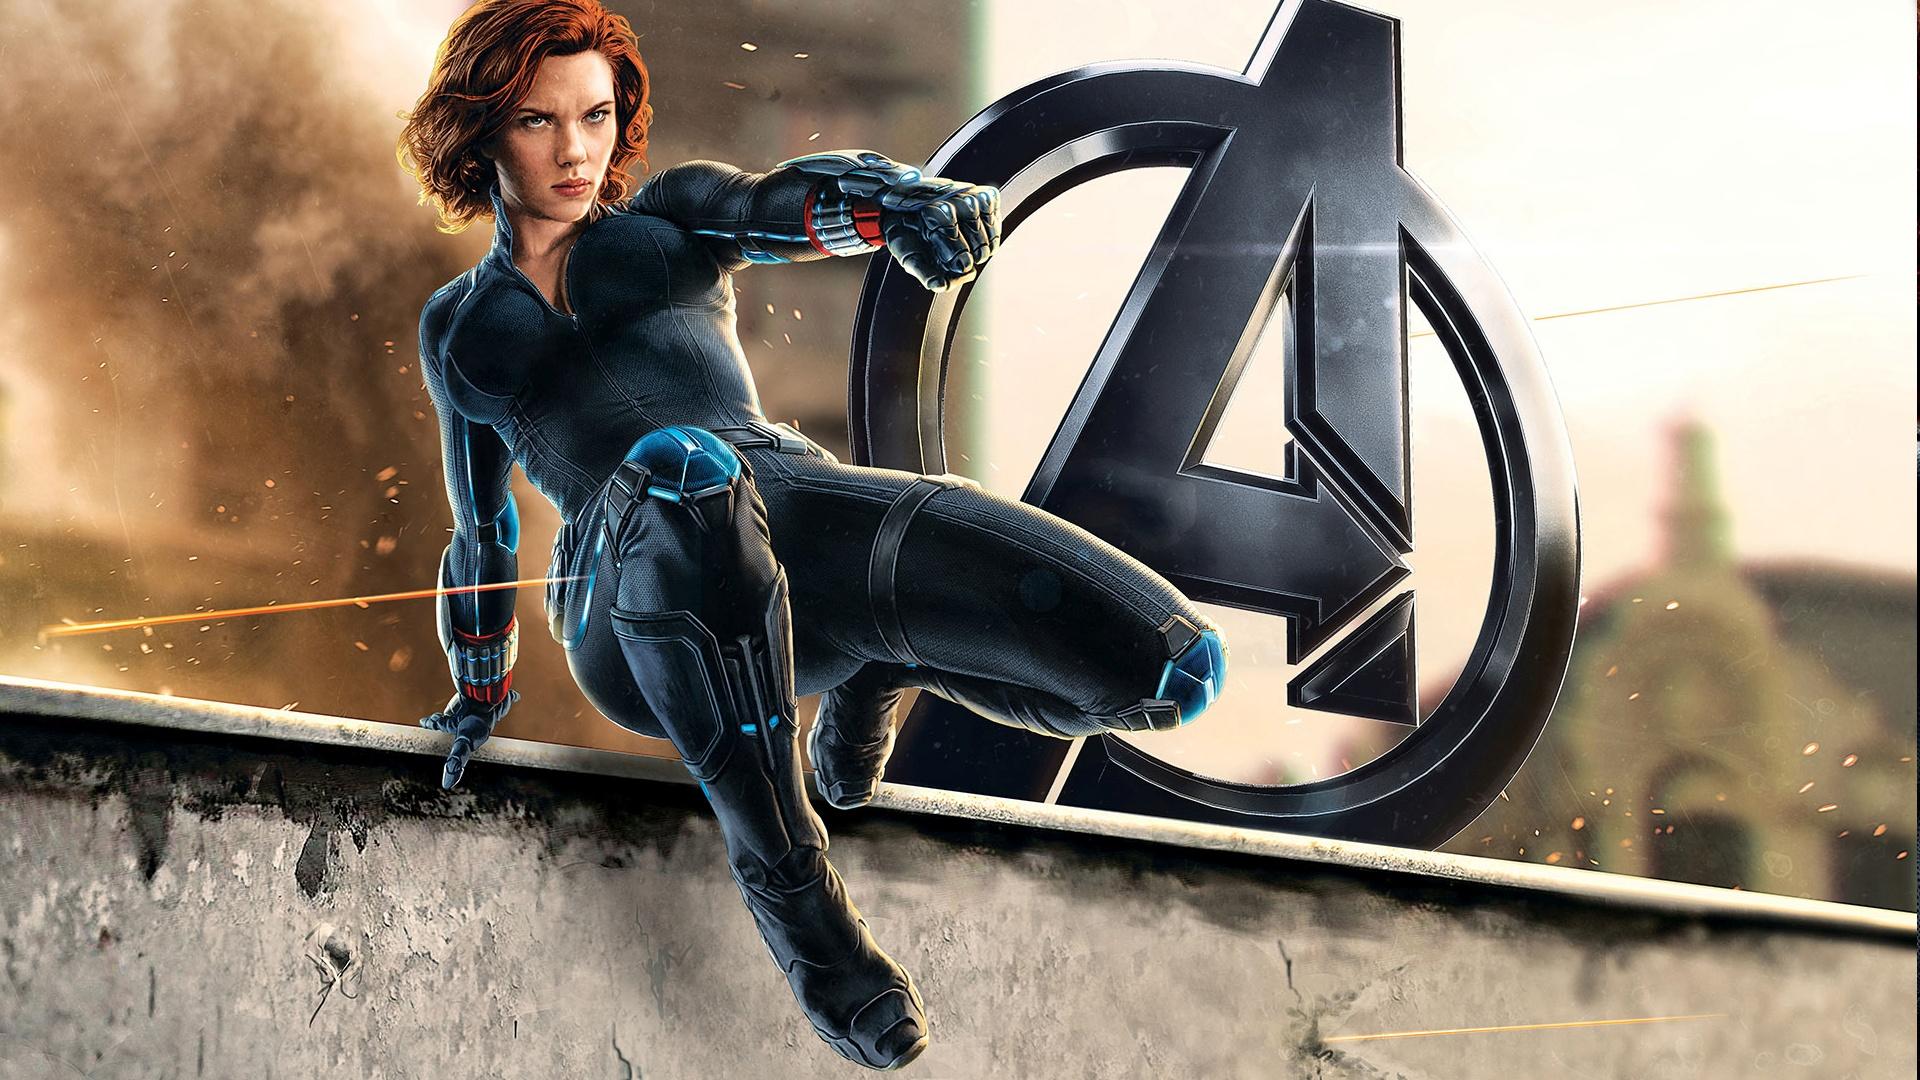 Black Widow desktop wallpaper free download